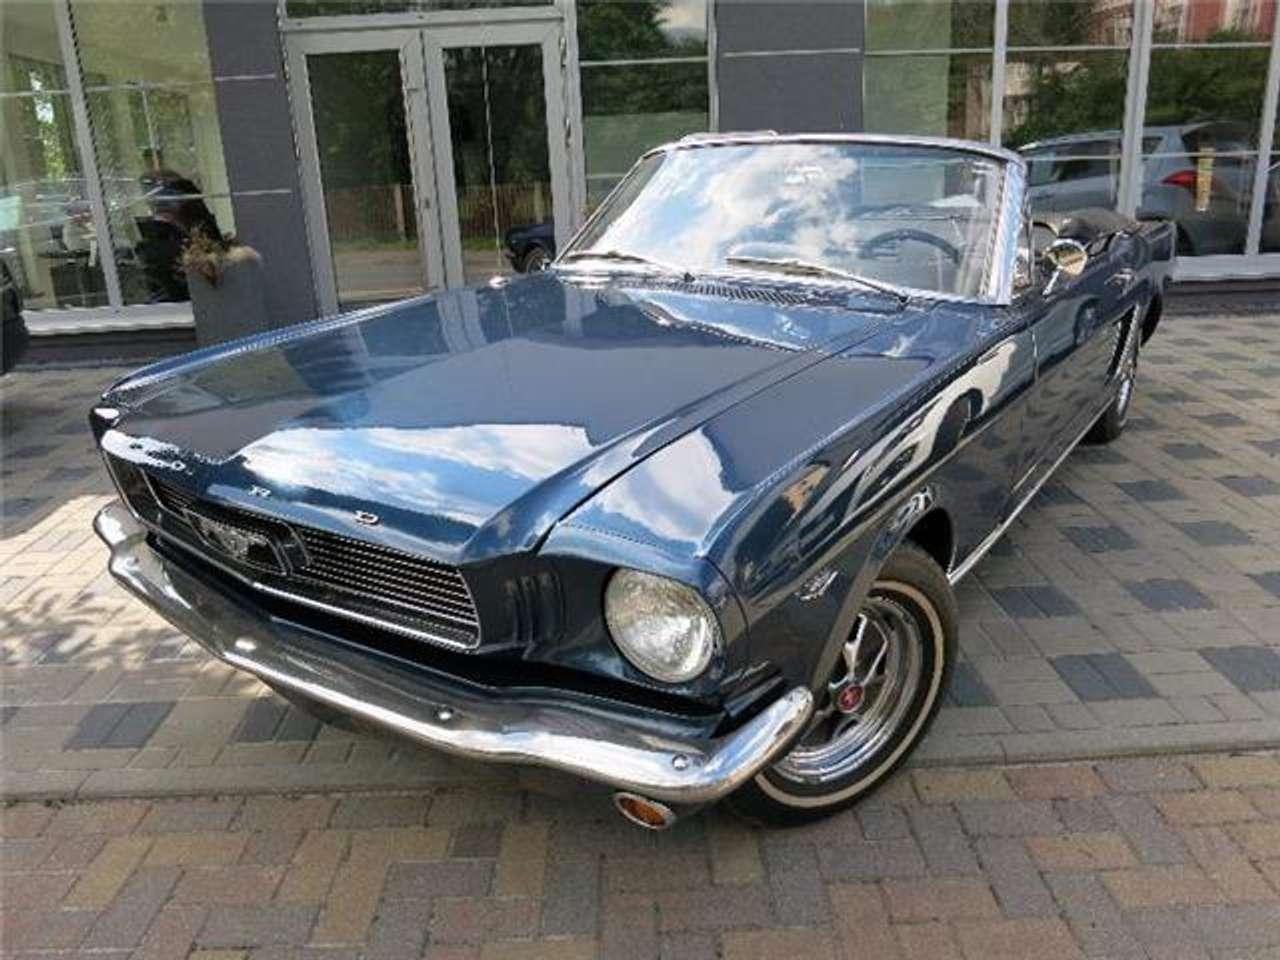 Ford Mustang Mustang 289 Cabrio V8 H-Zul. Leasing möglich!